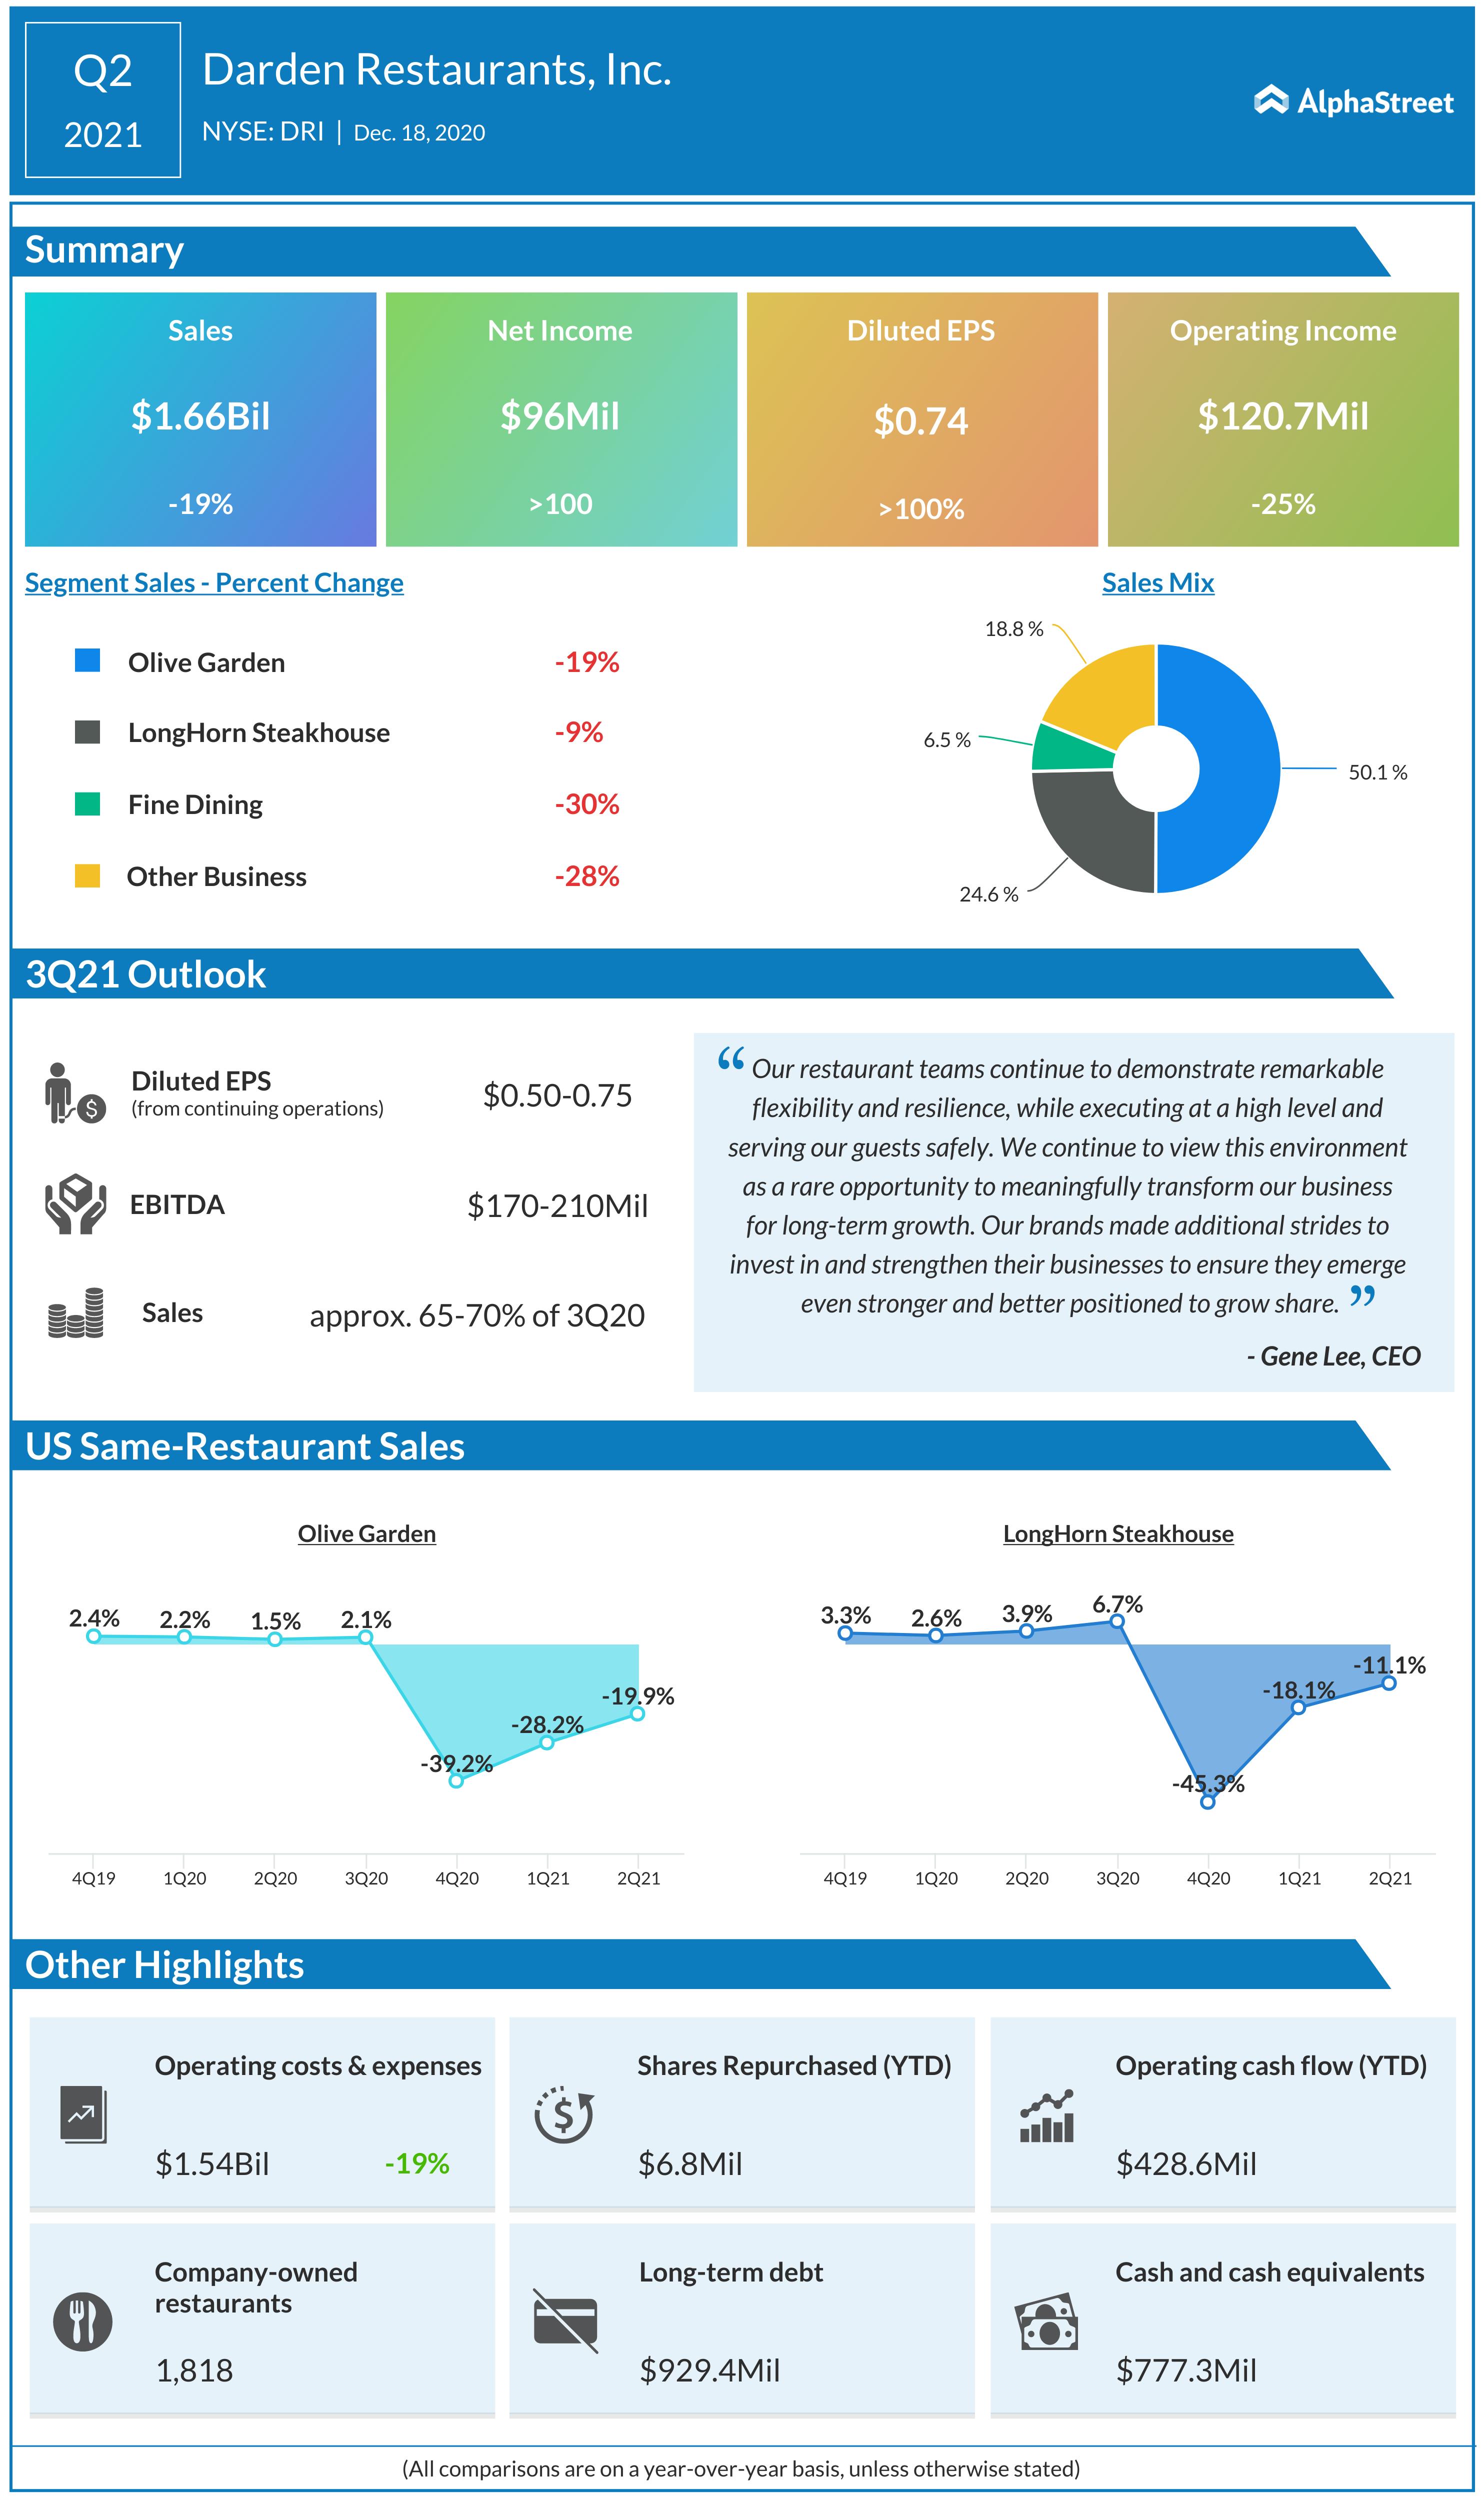 Darden Restaurants Q2 2021 earnings infographic